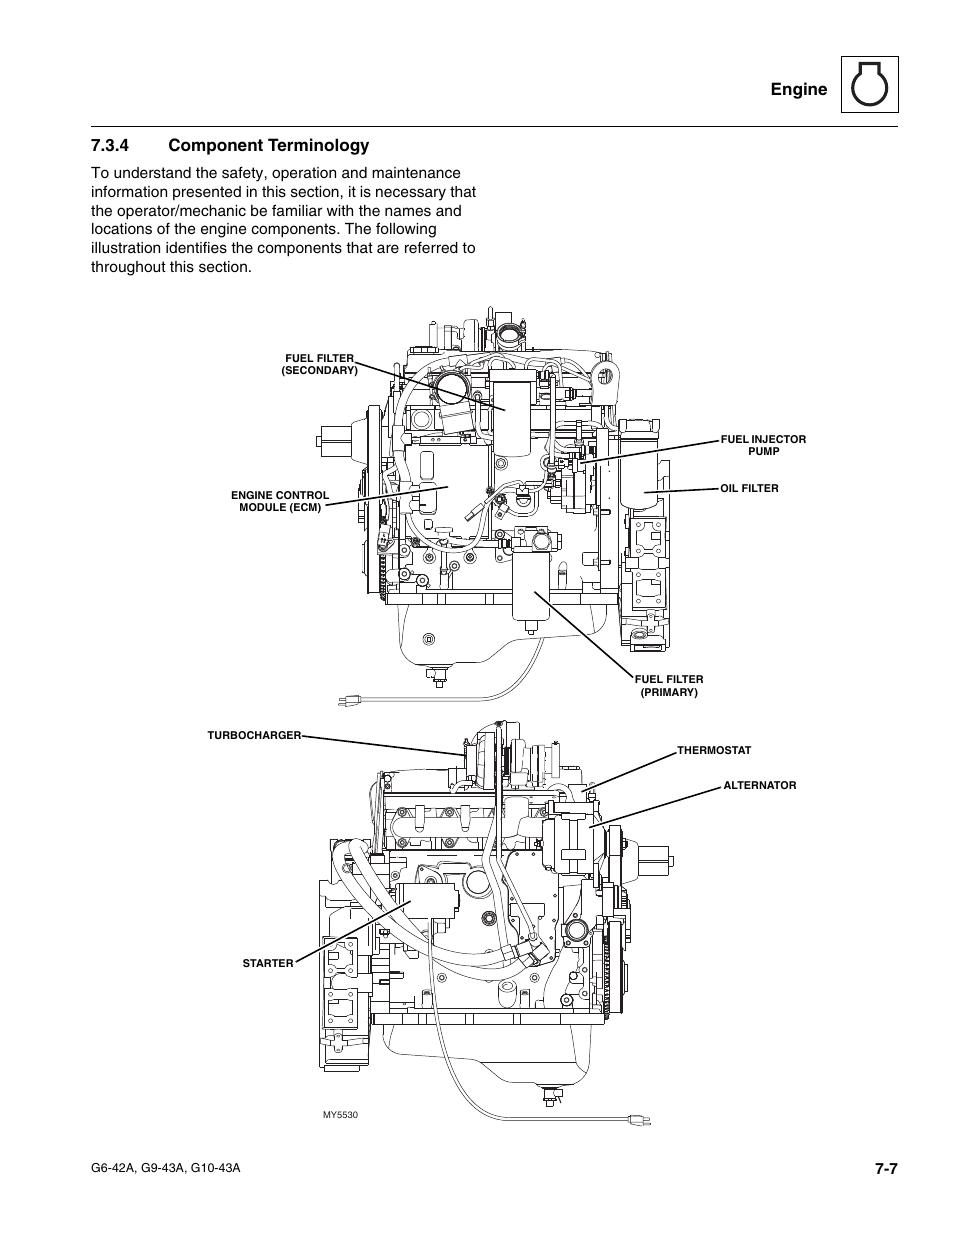 4 component terminology, Component terminology, Engine 7.3